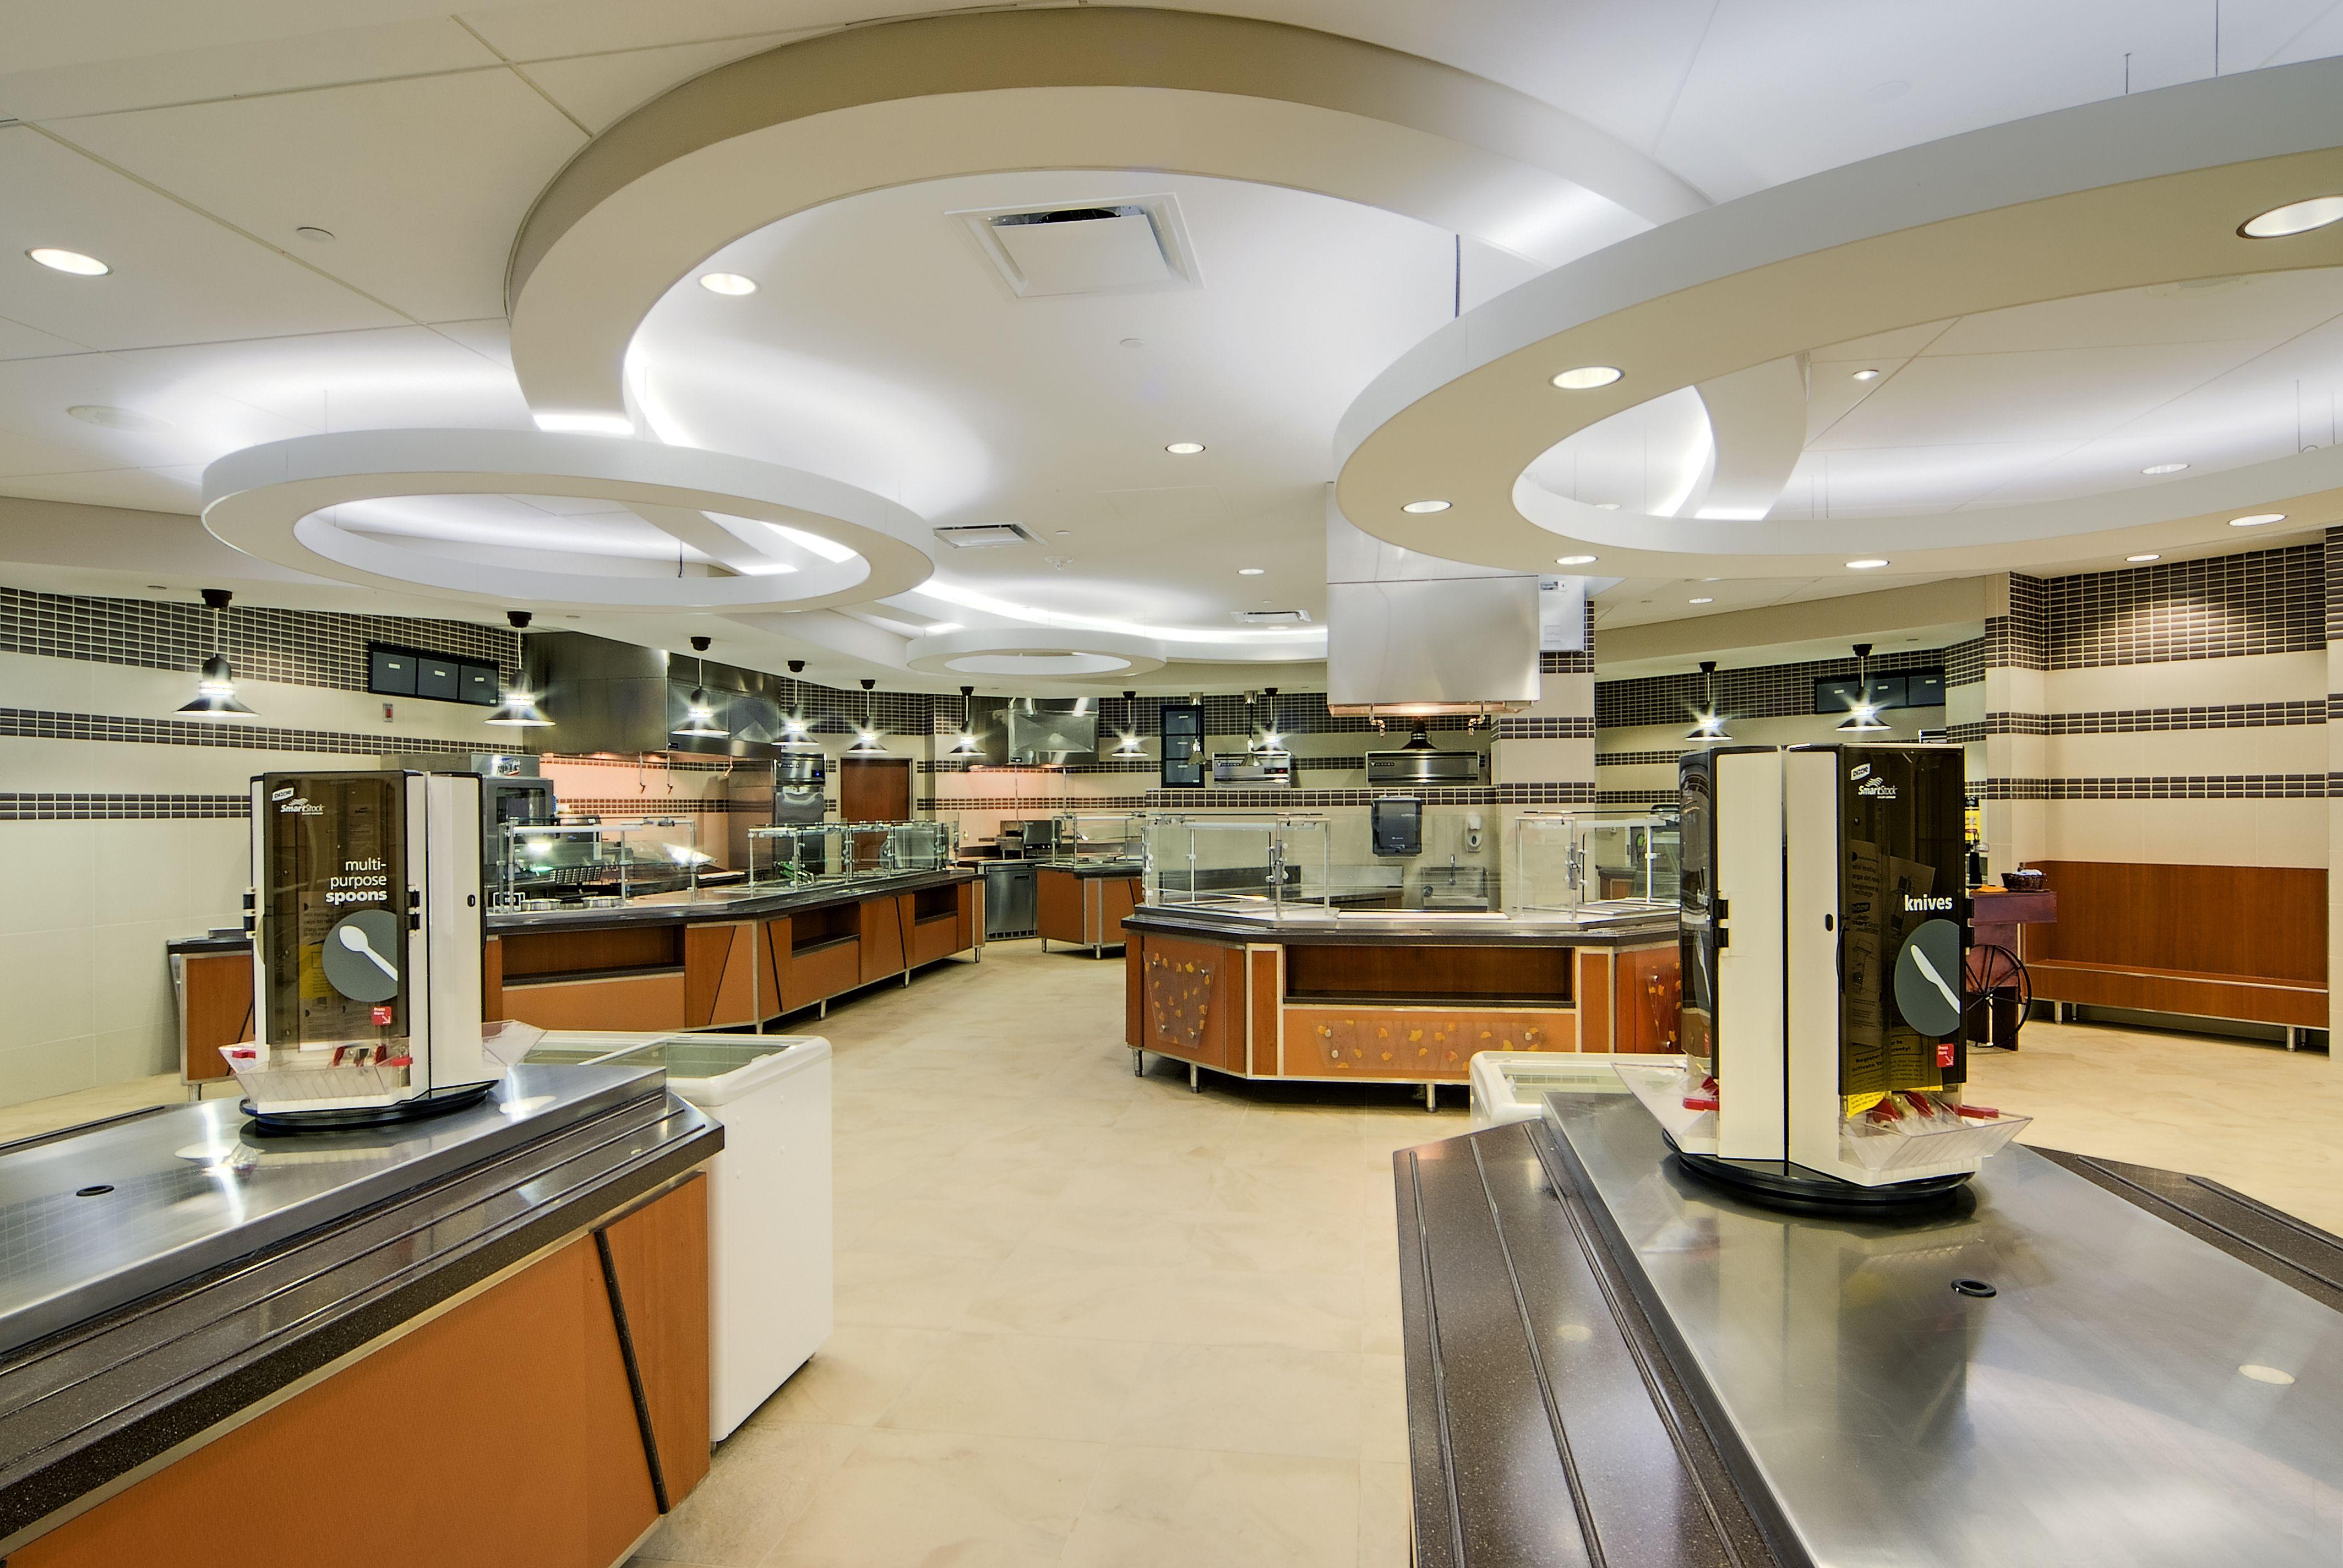 OLOL Hospital Cafeteria | My Designs in 2019 | Cafe design ...